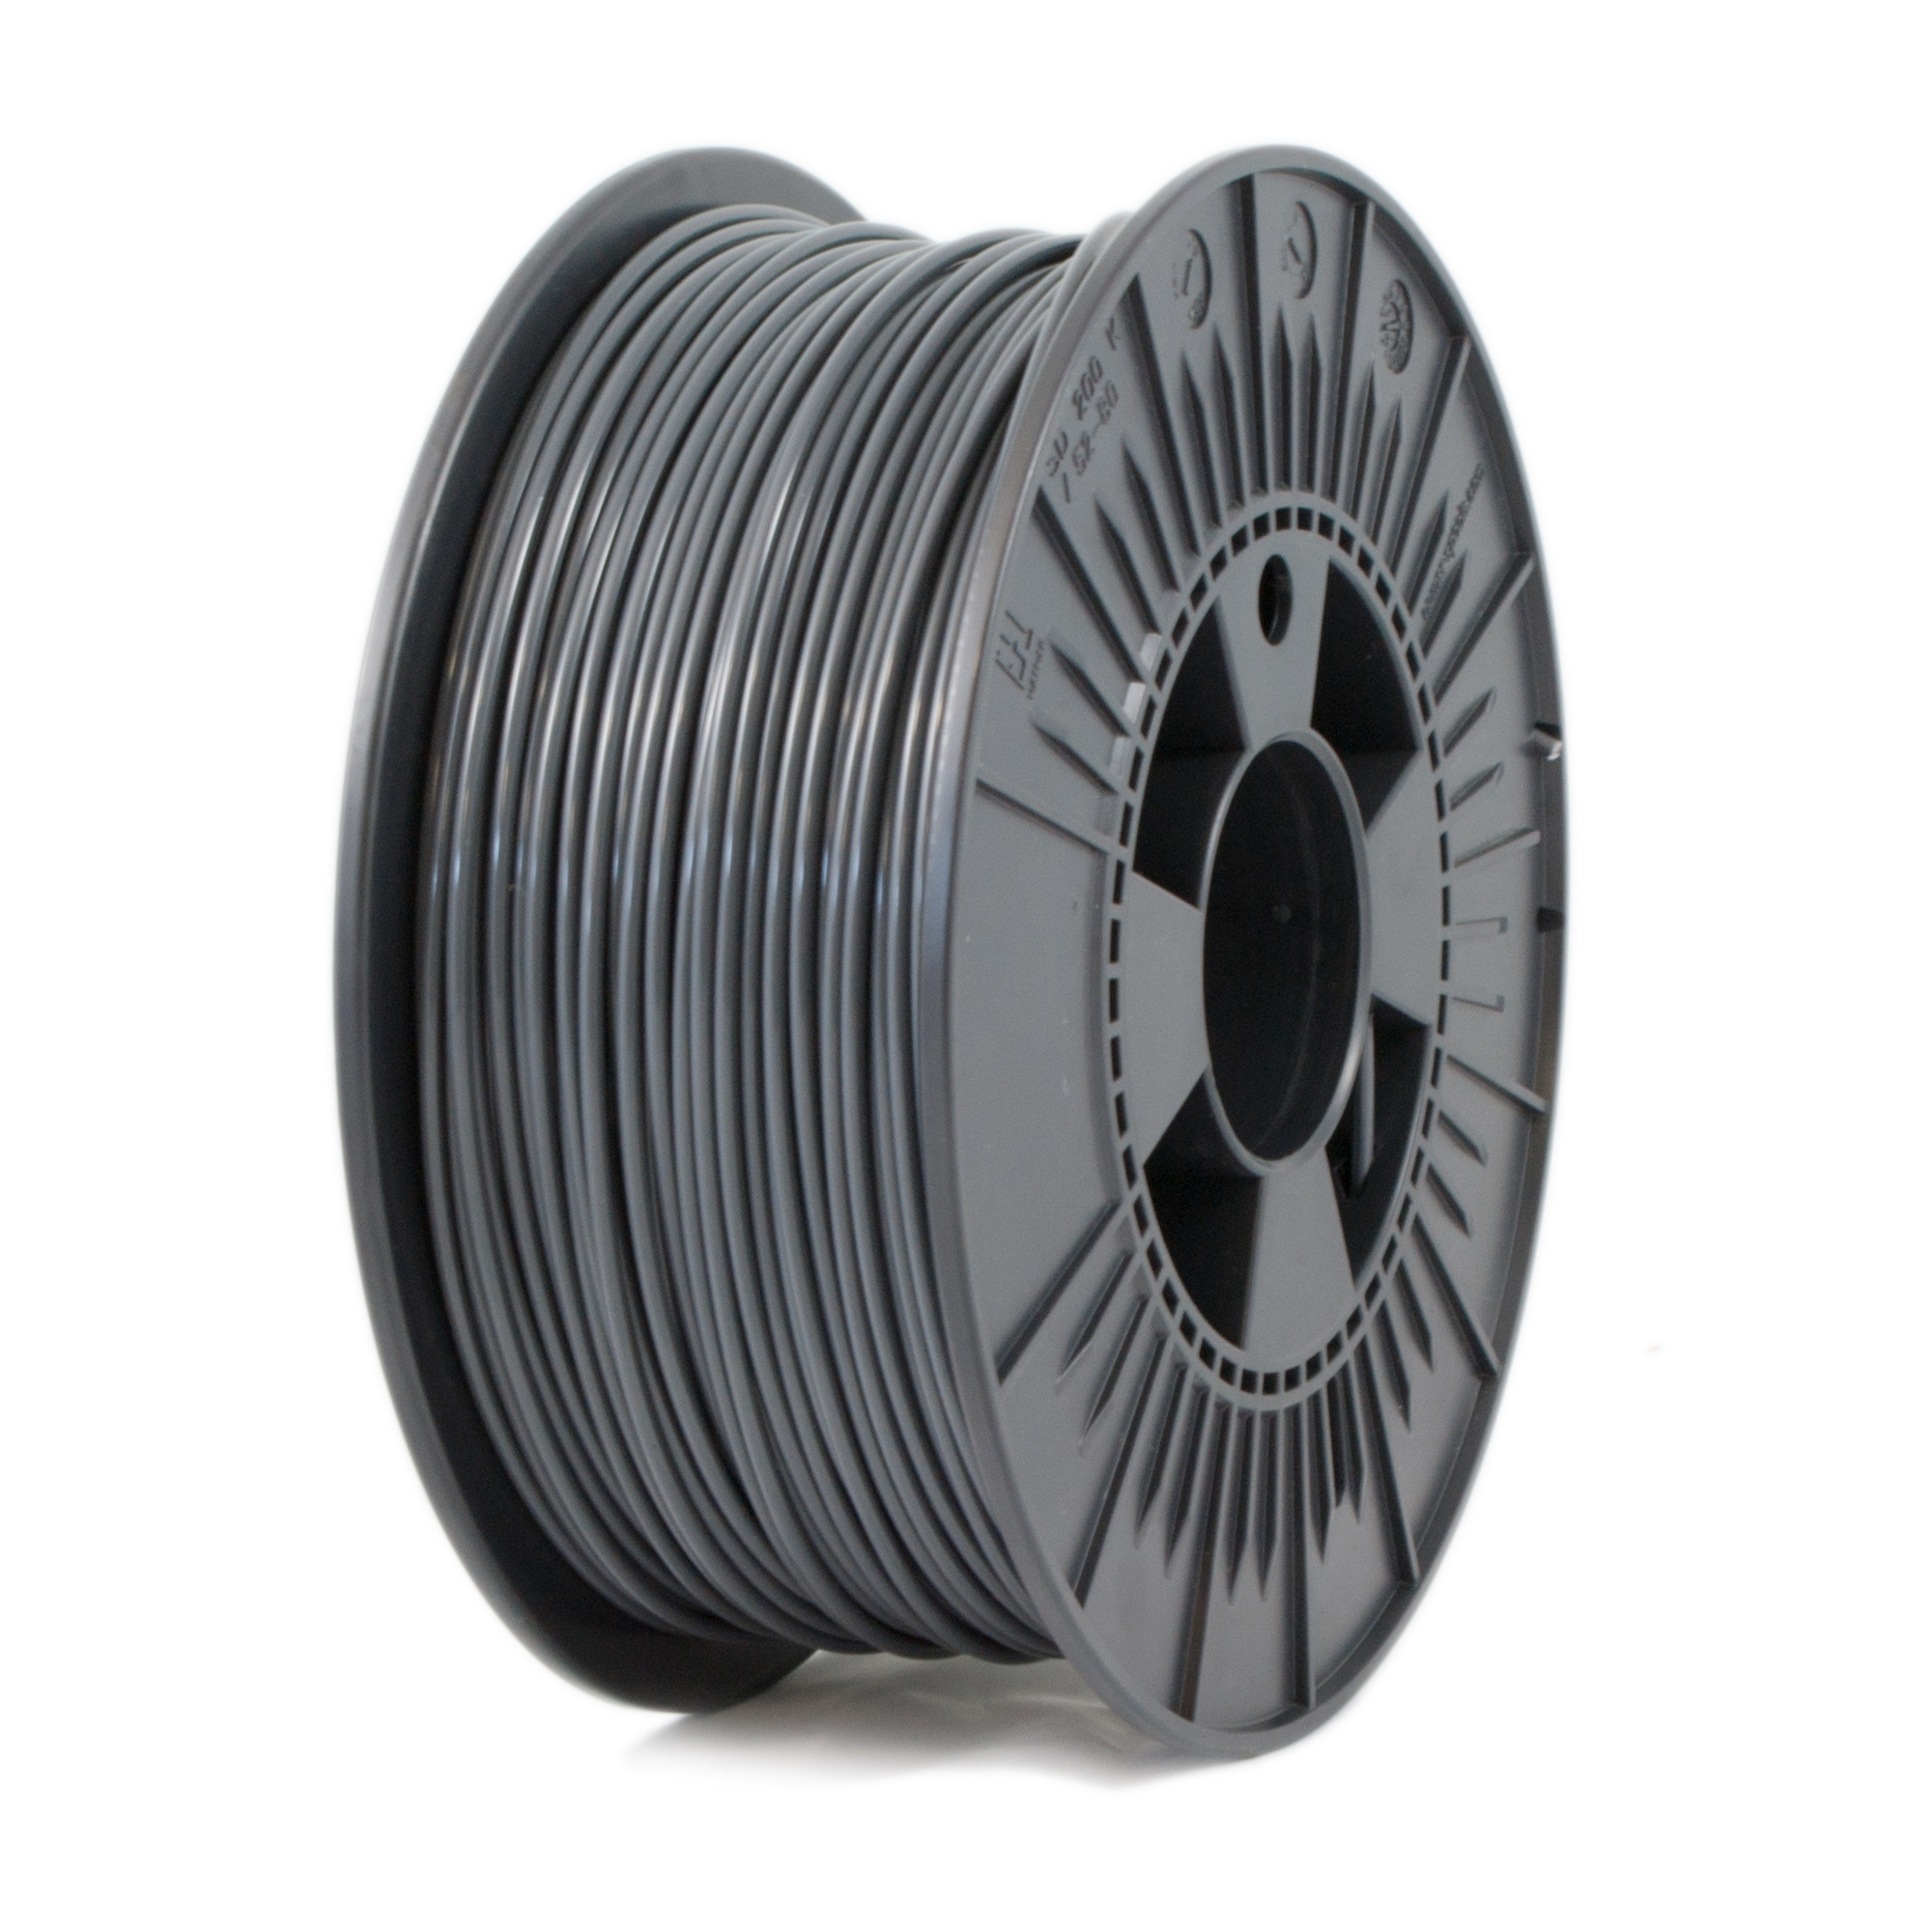 Filamentive  Grey PLA 1.75 mm